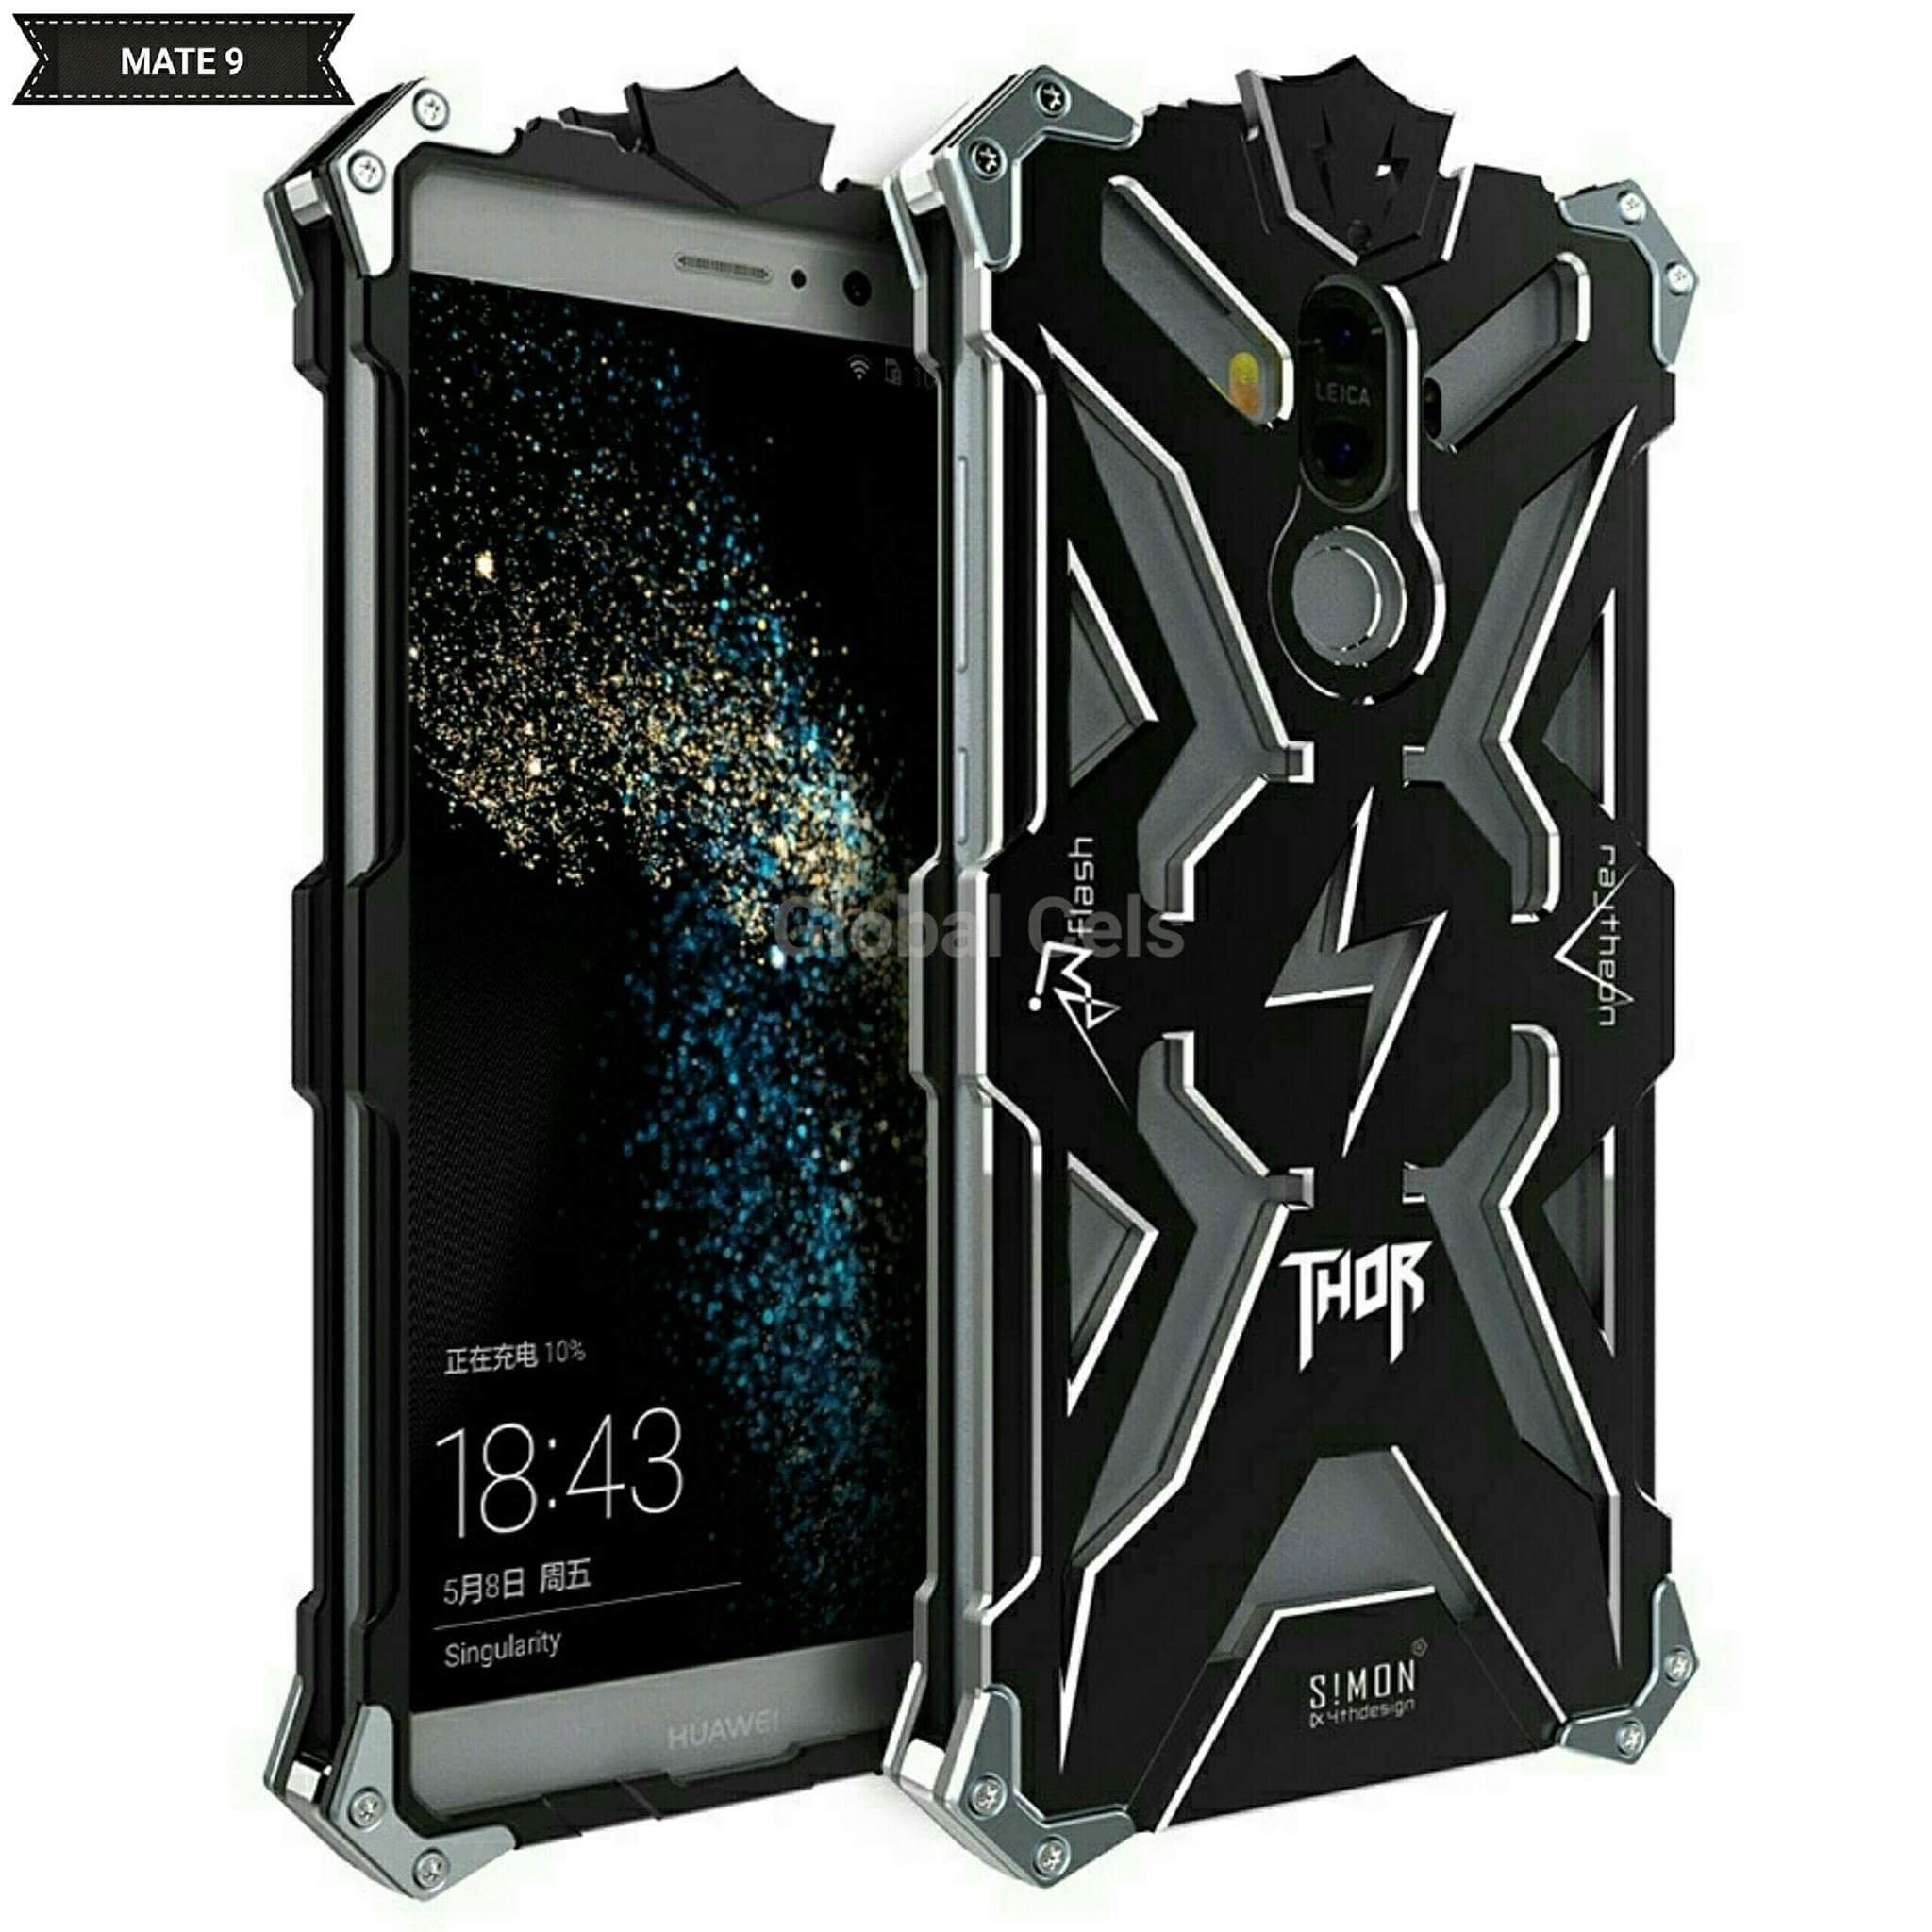 Case Metal Huawei Mate 9 Armadura Thor con Pernos Negro 00210